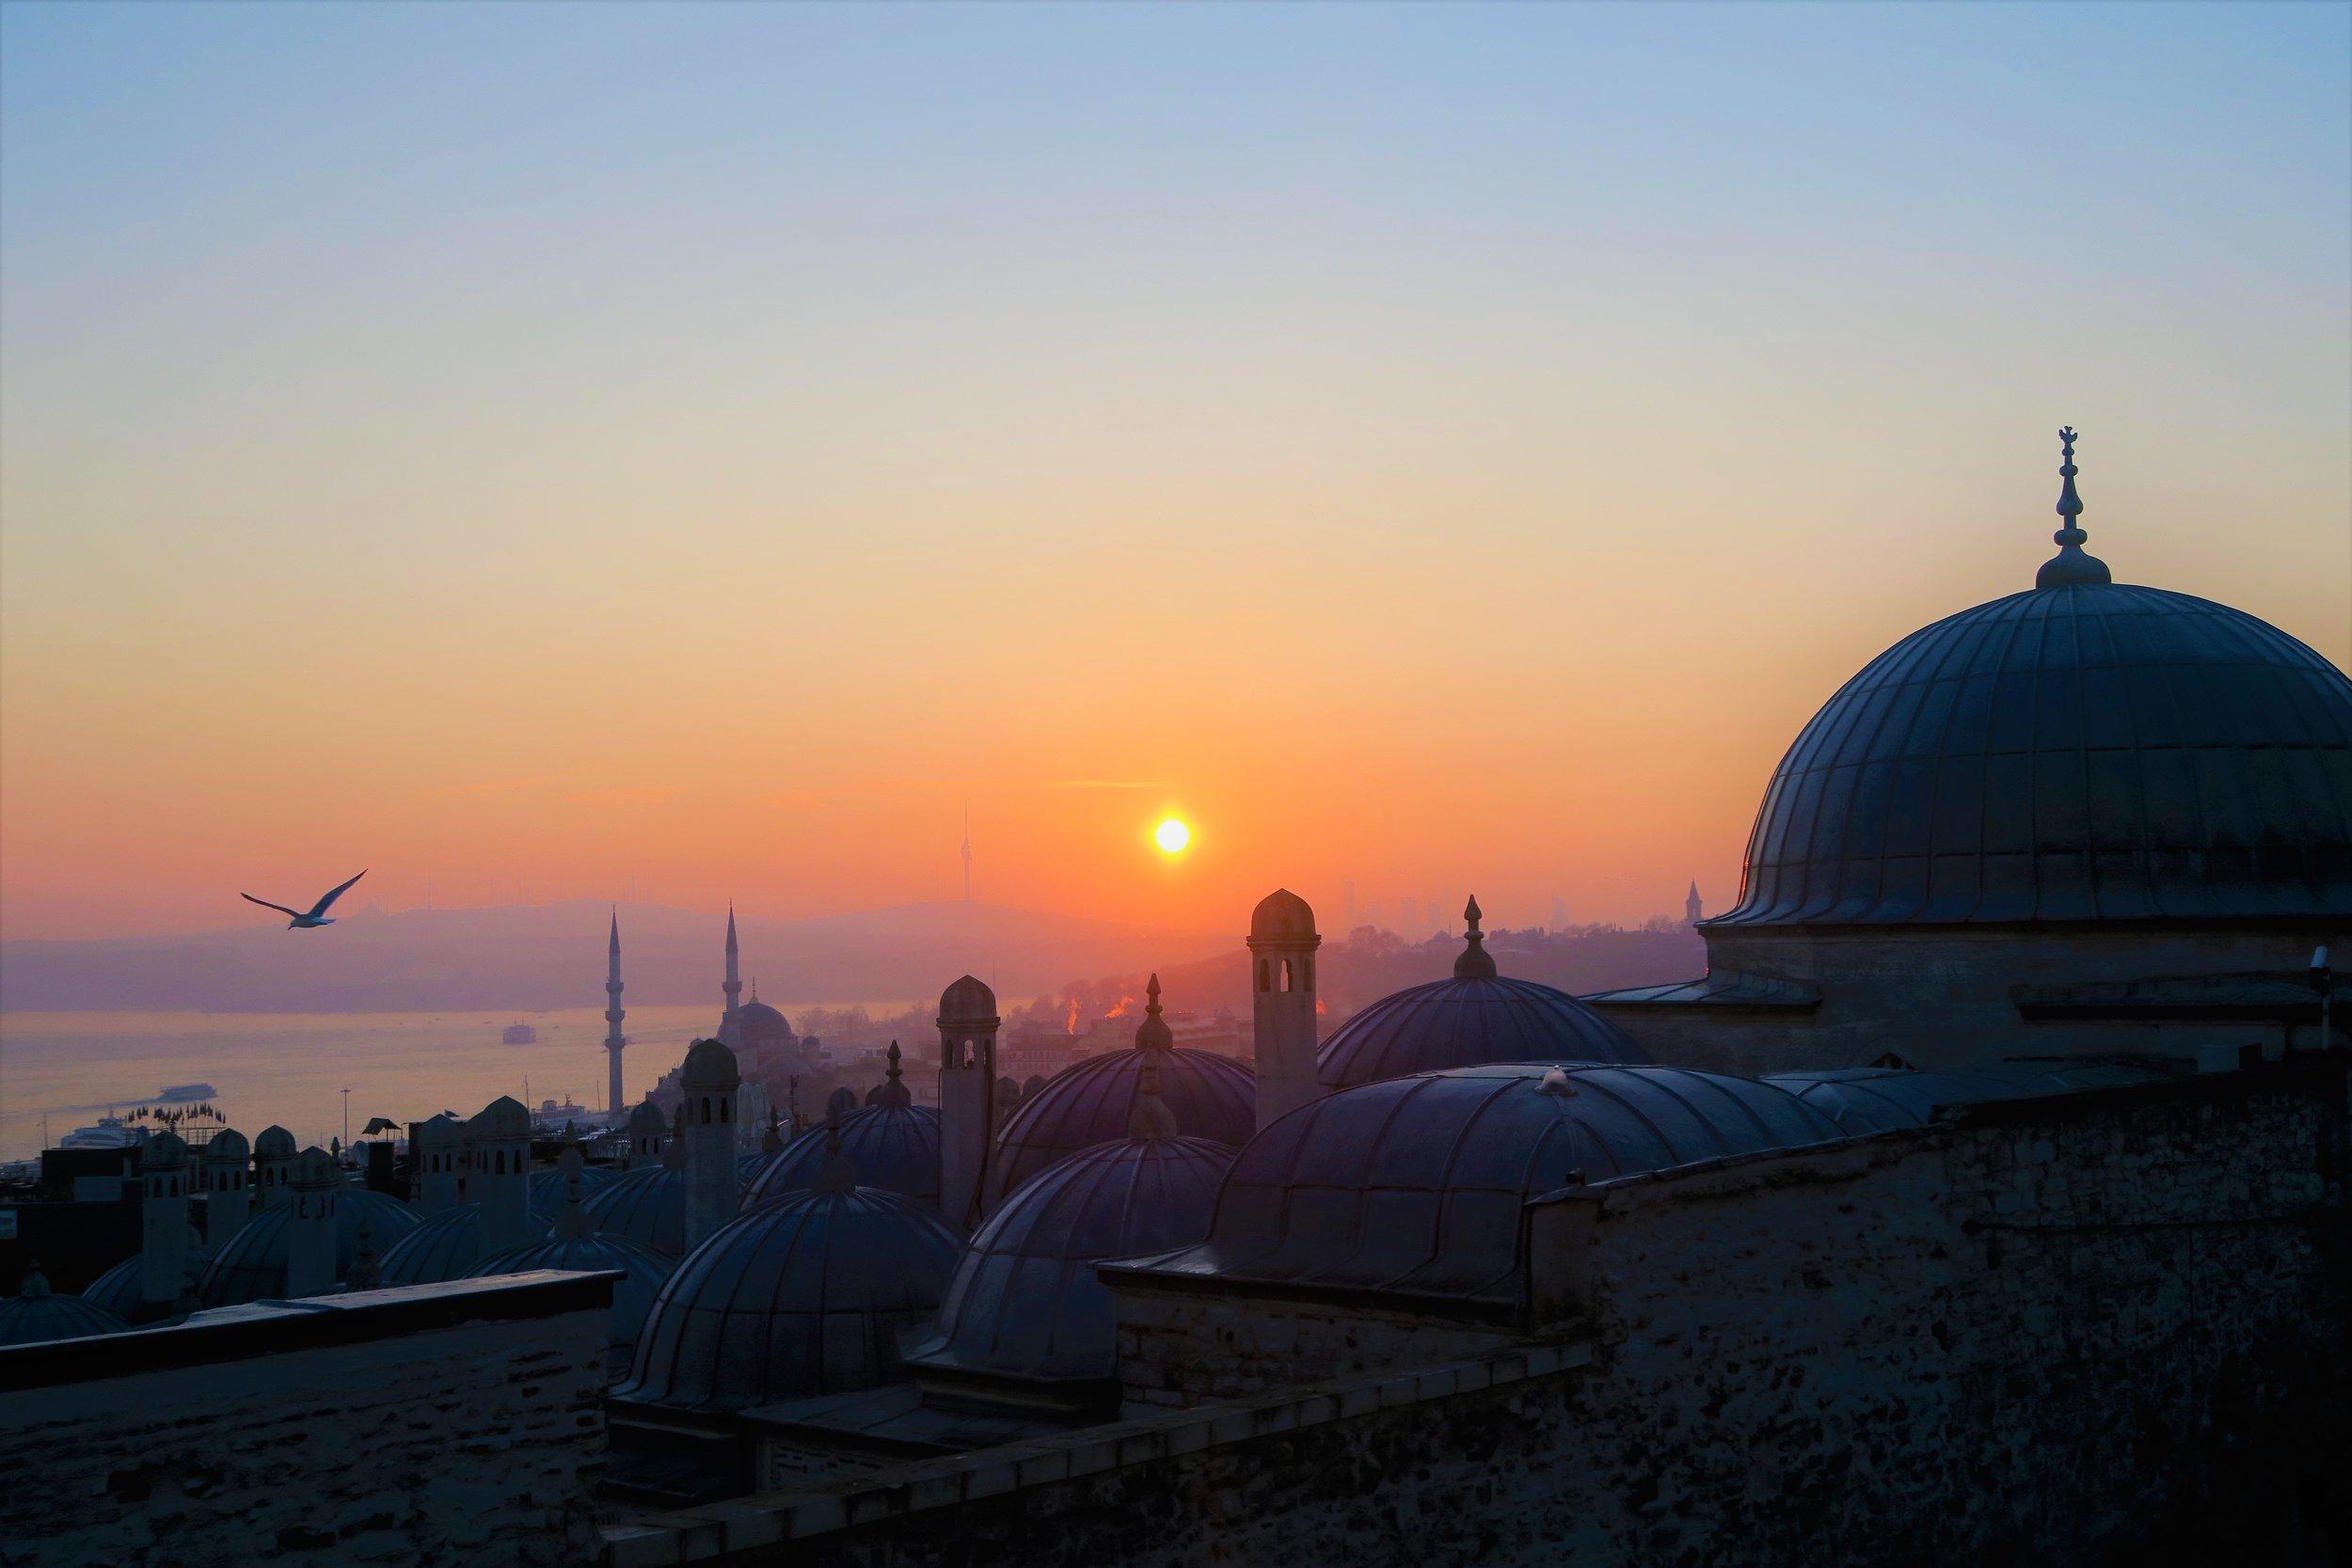 a-mosque-architecture-buildings-2236674.jpeg